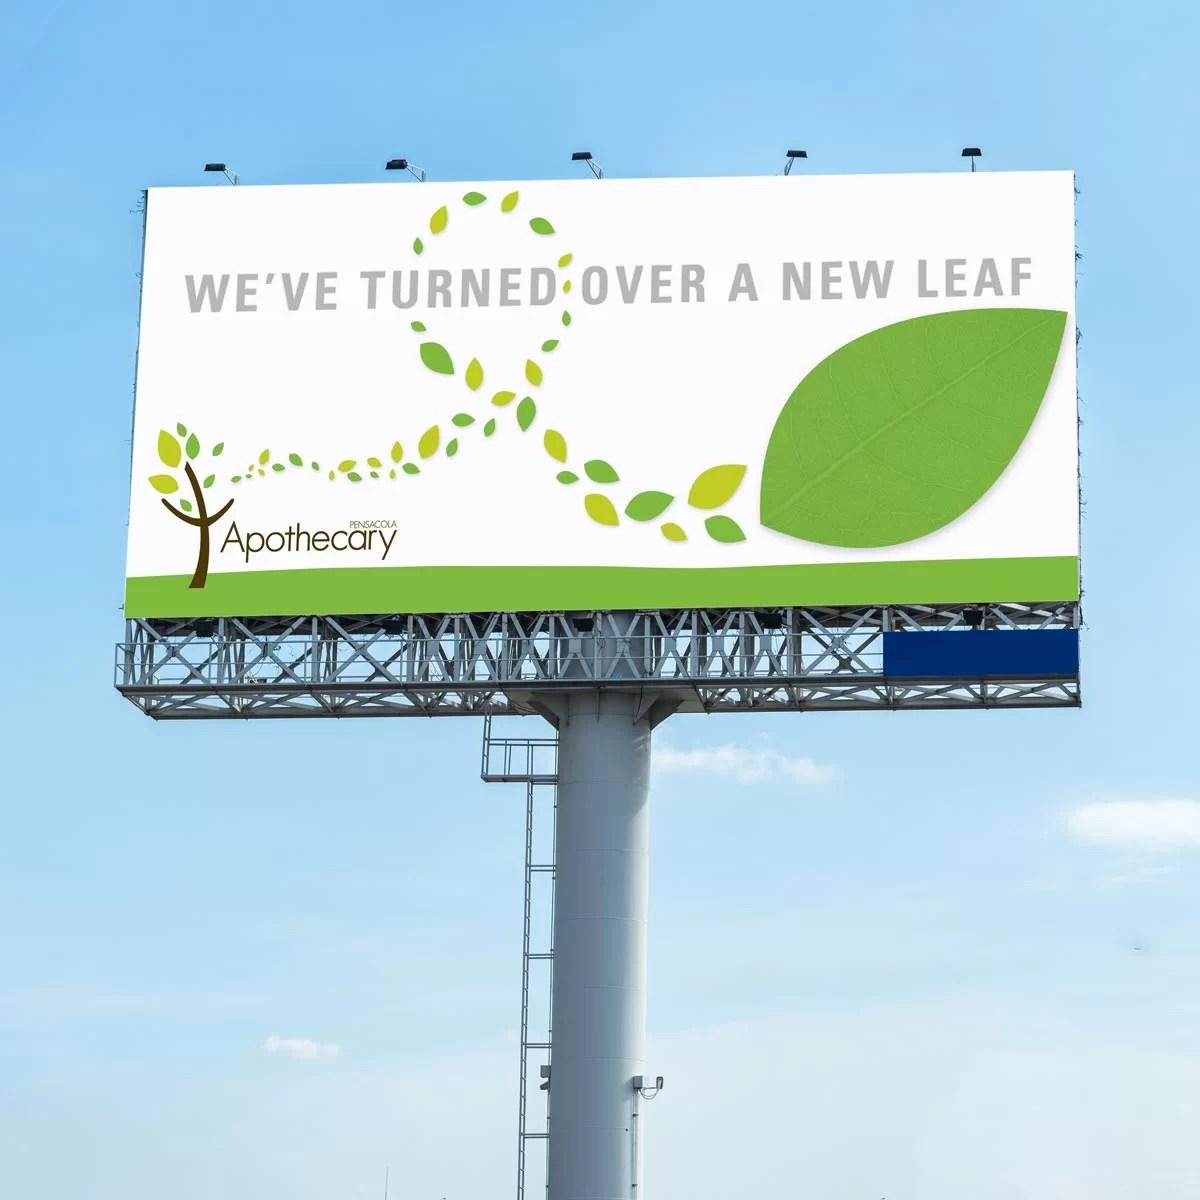 Everwell Billboard, Lucid Advertising